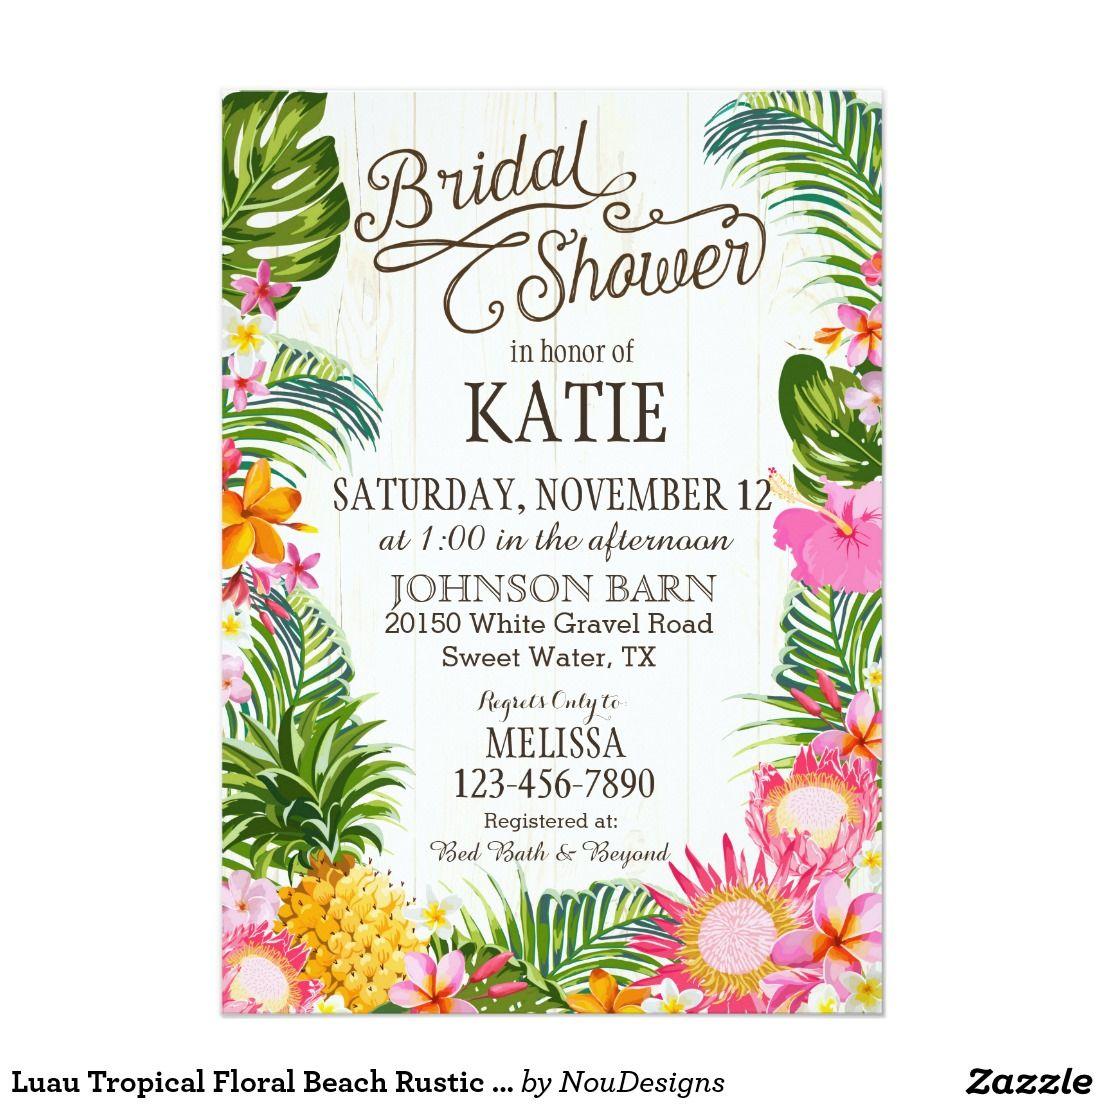 Luau Hawaiian Beach Rustic Bridal Shower Invitation | Pinterest ...